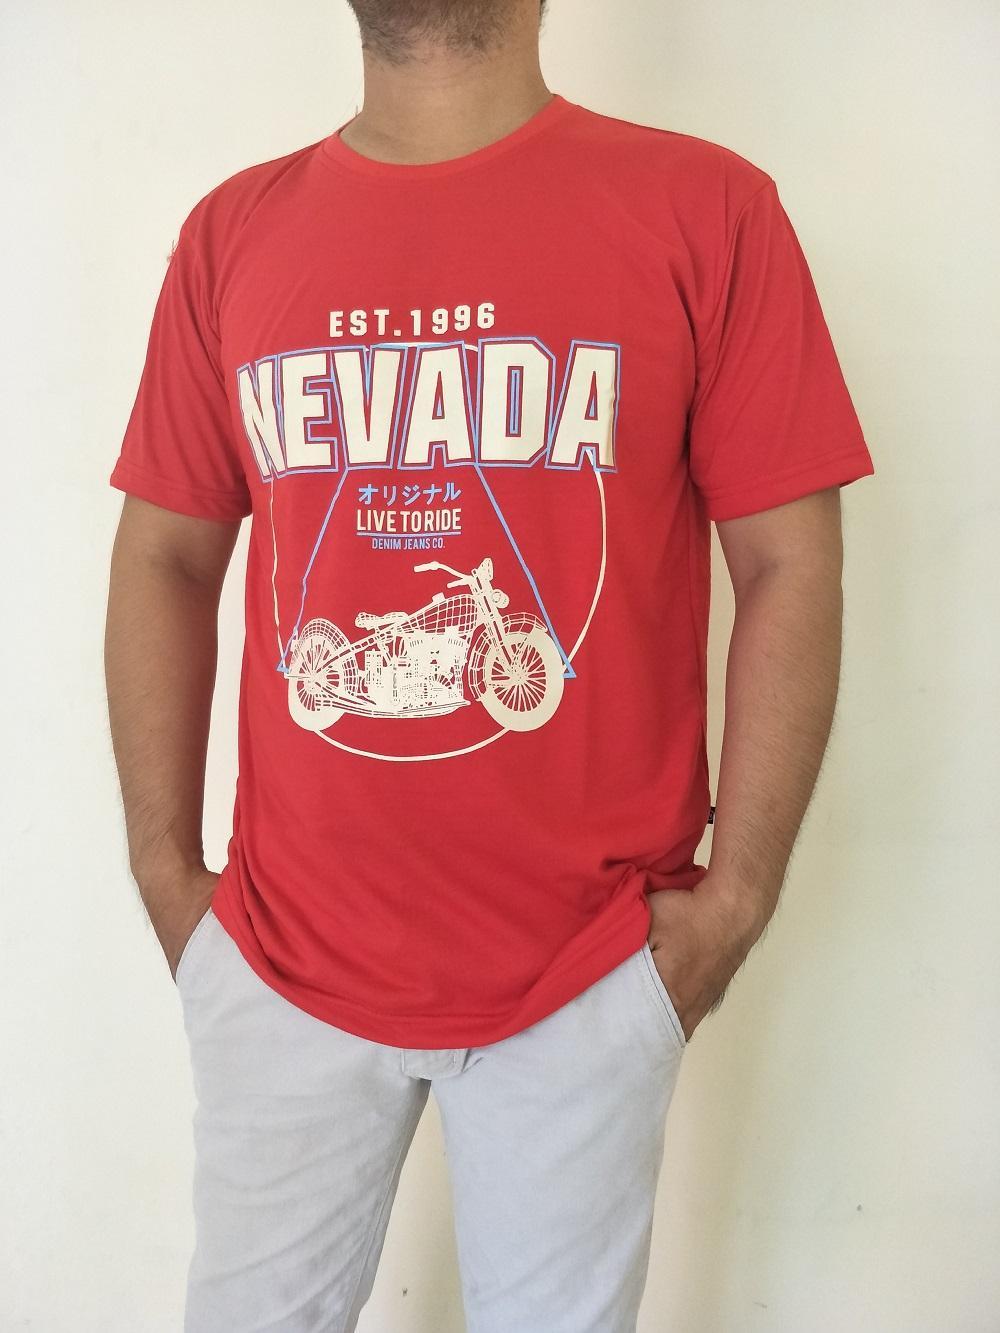 240  Kaos distro Nevada premium Quality TSHIRT PRIA / RAGLAN / KAOS PRIA / KAOS BRANDED ORIGINAL MATAHARI